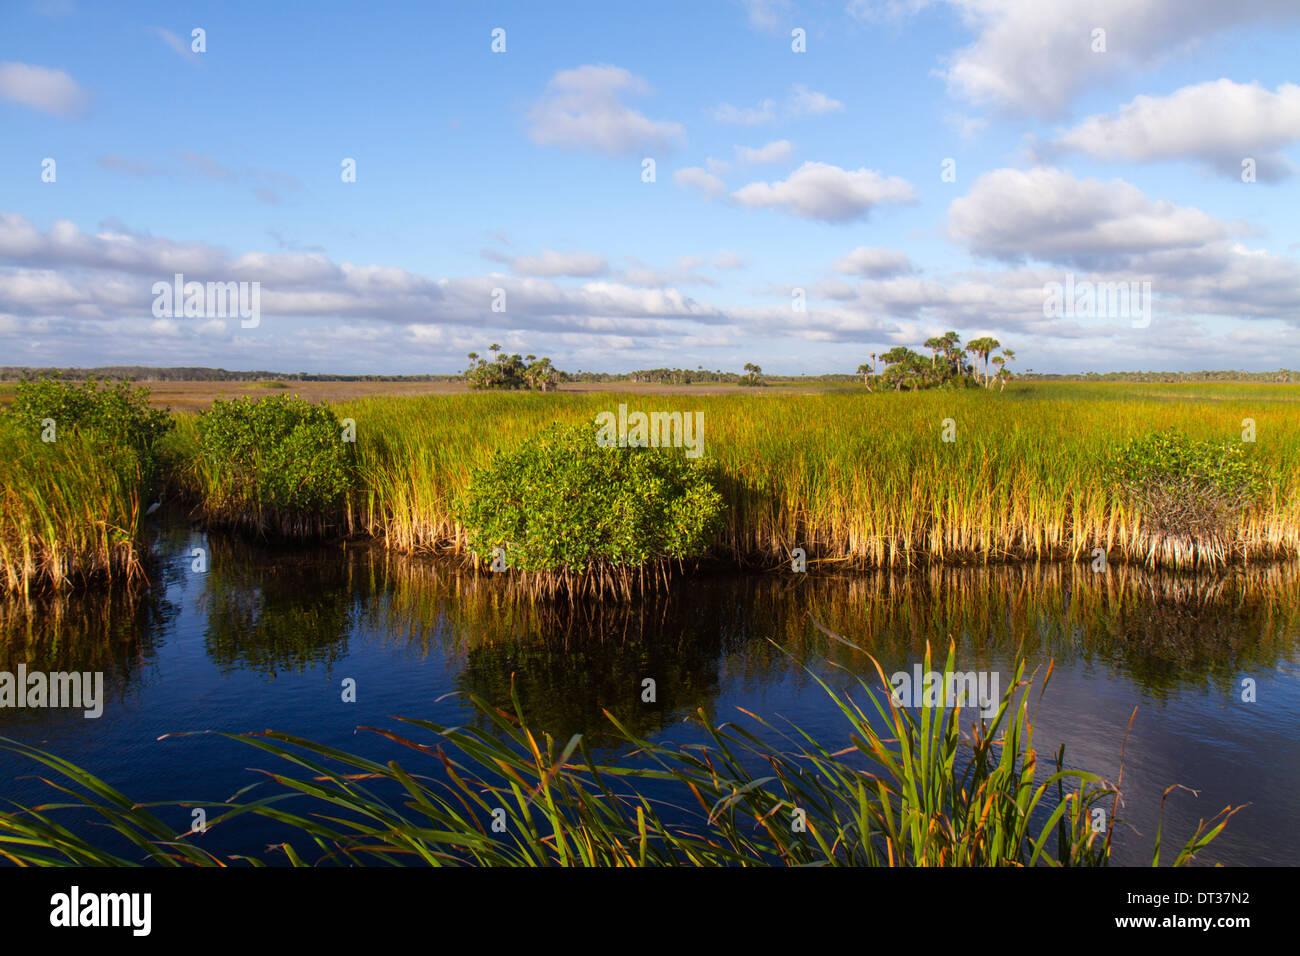 Everglades Florida Big Cypress National Preserve Tamiami Trail US 41 sawgrass palm tree hammock water mangrove Stock Photo